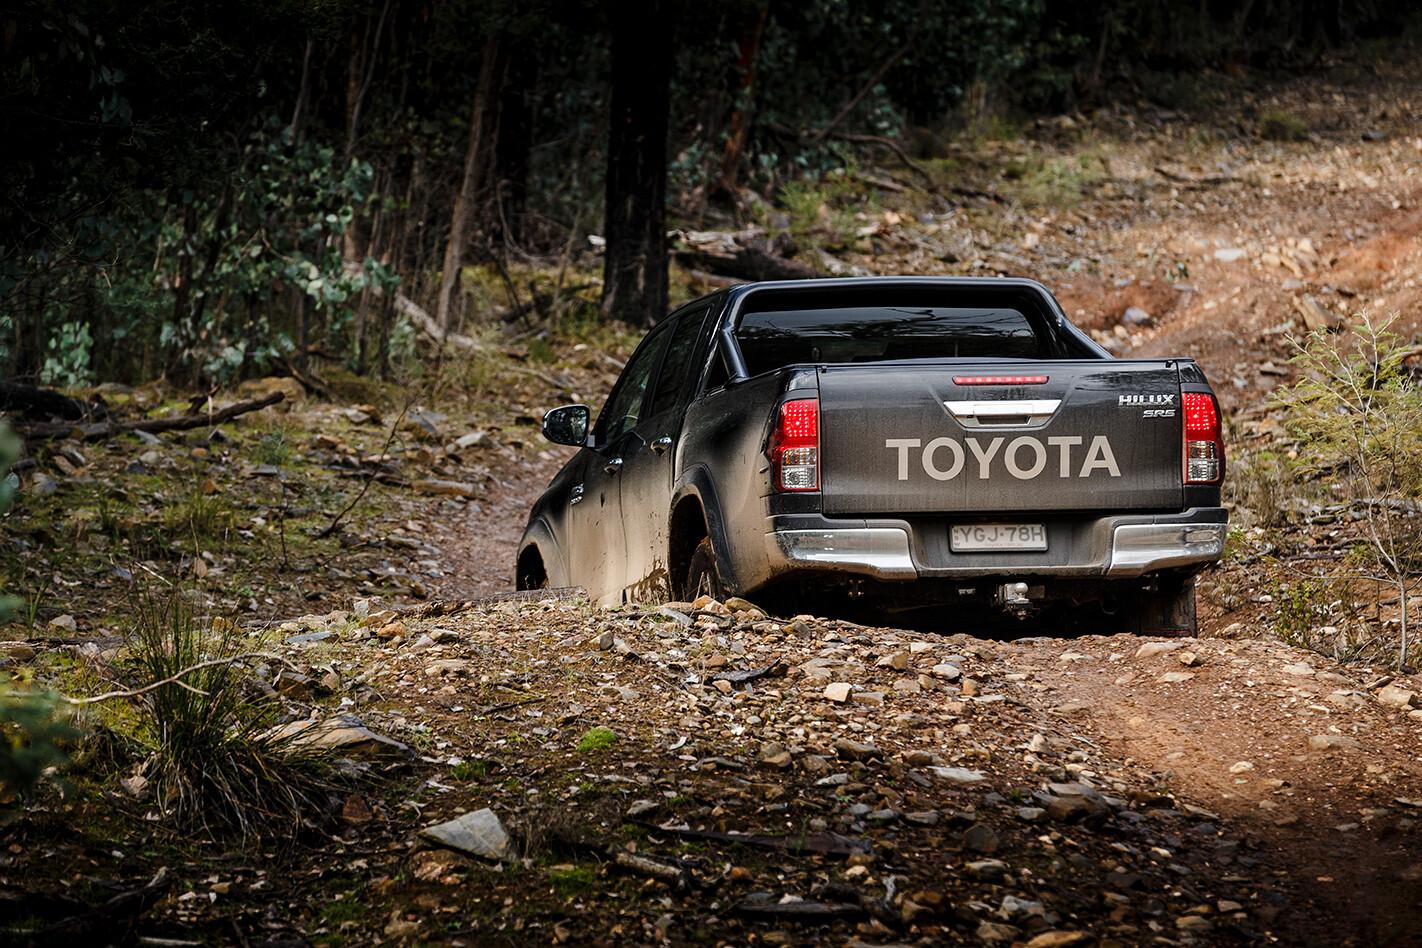 Toyota Hilux TRD tray.jpg